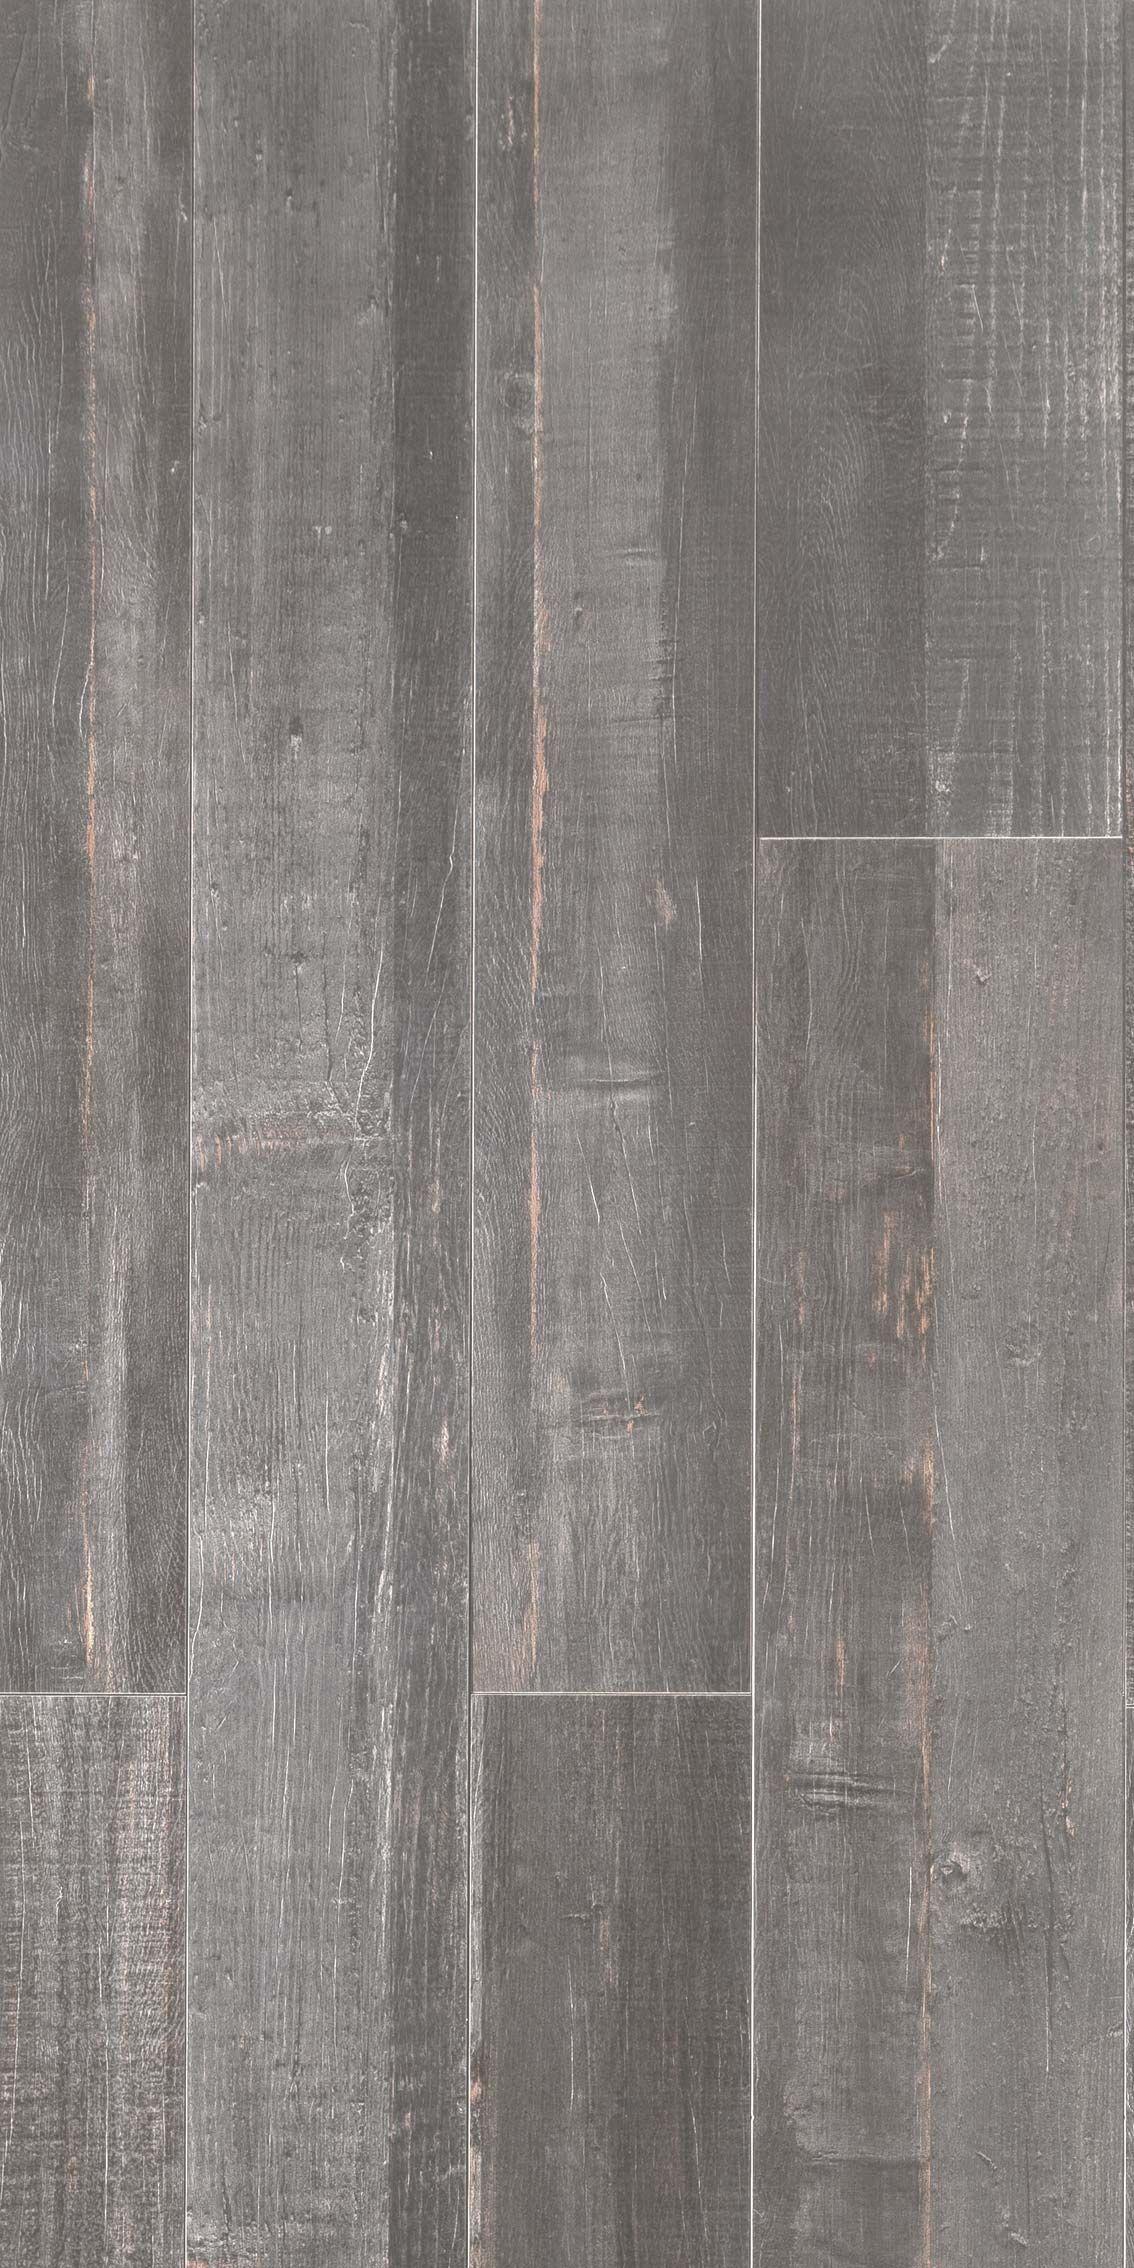 Wood texture Seamless green / gray woodgrain Wood